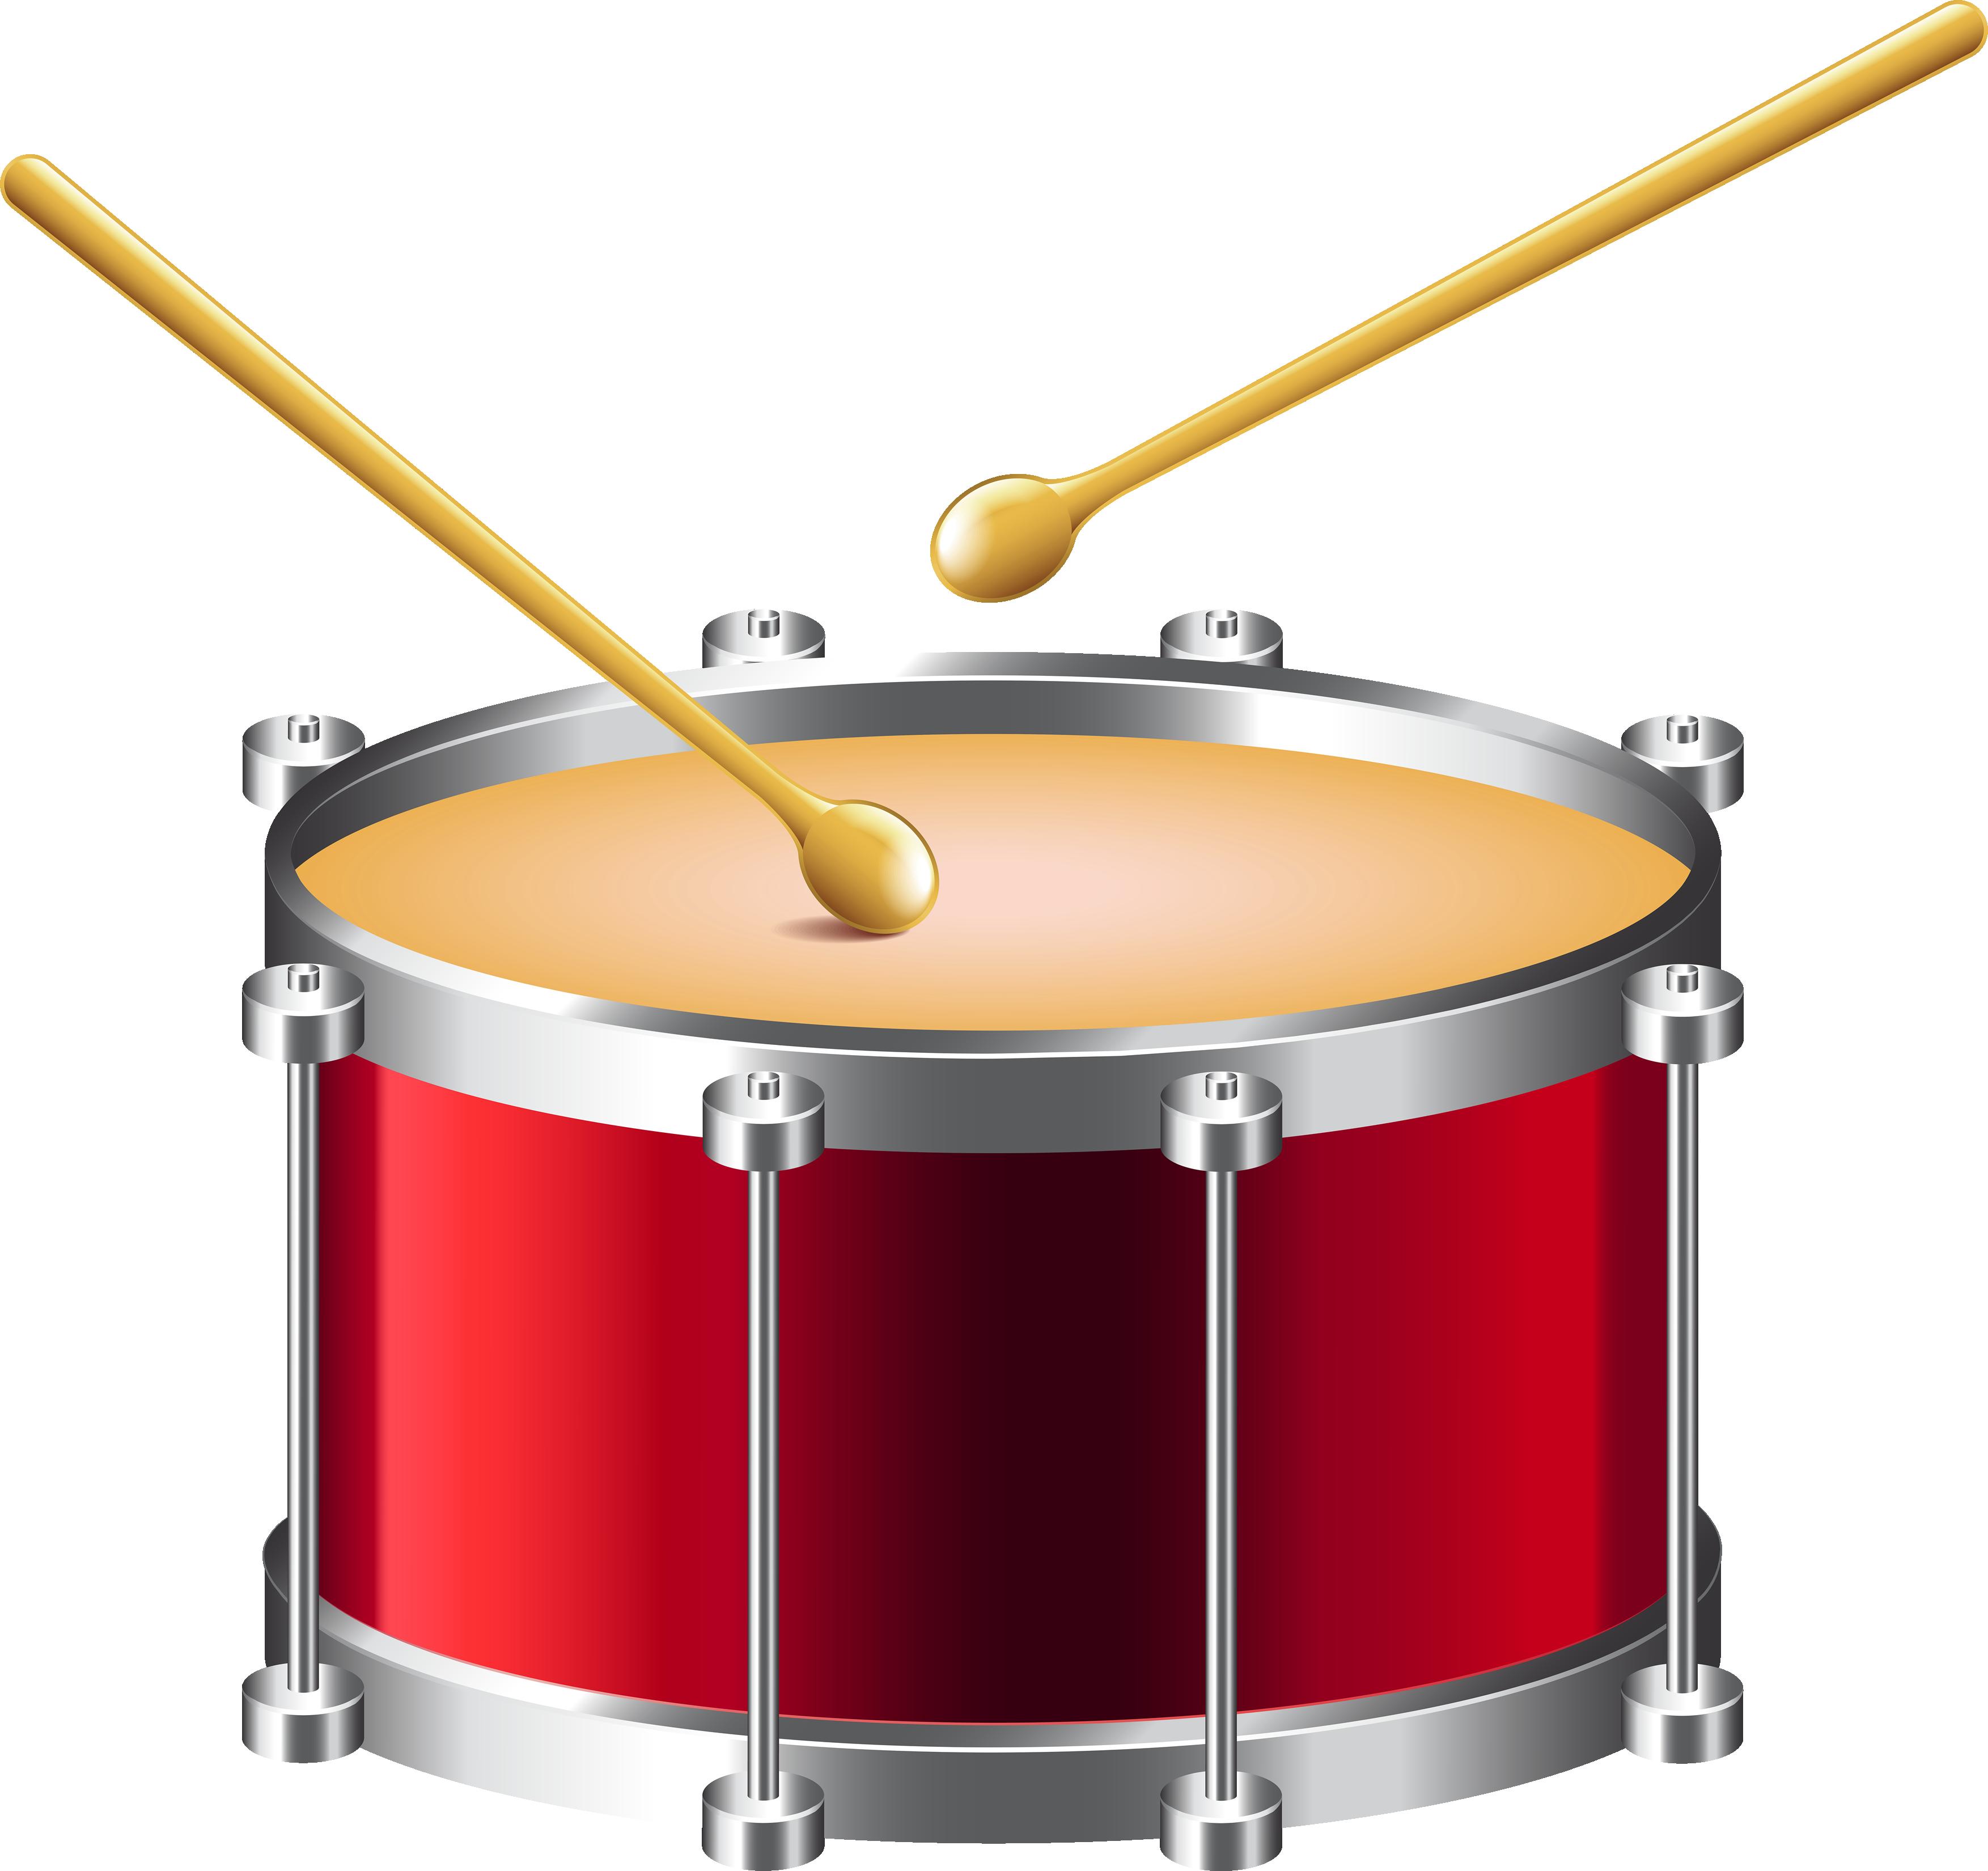 Drums kit png image. Clipart guitar drum